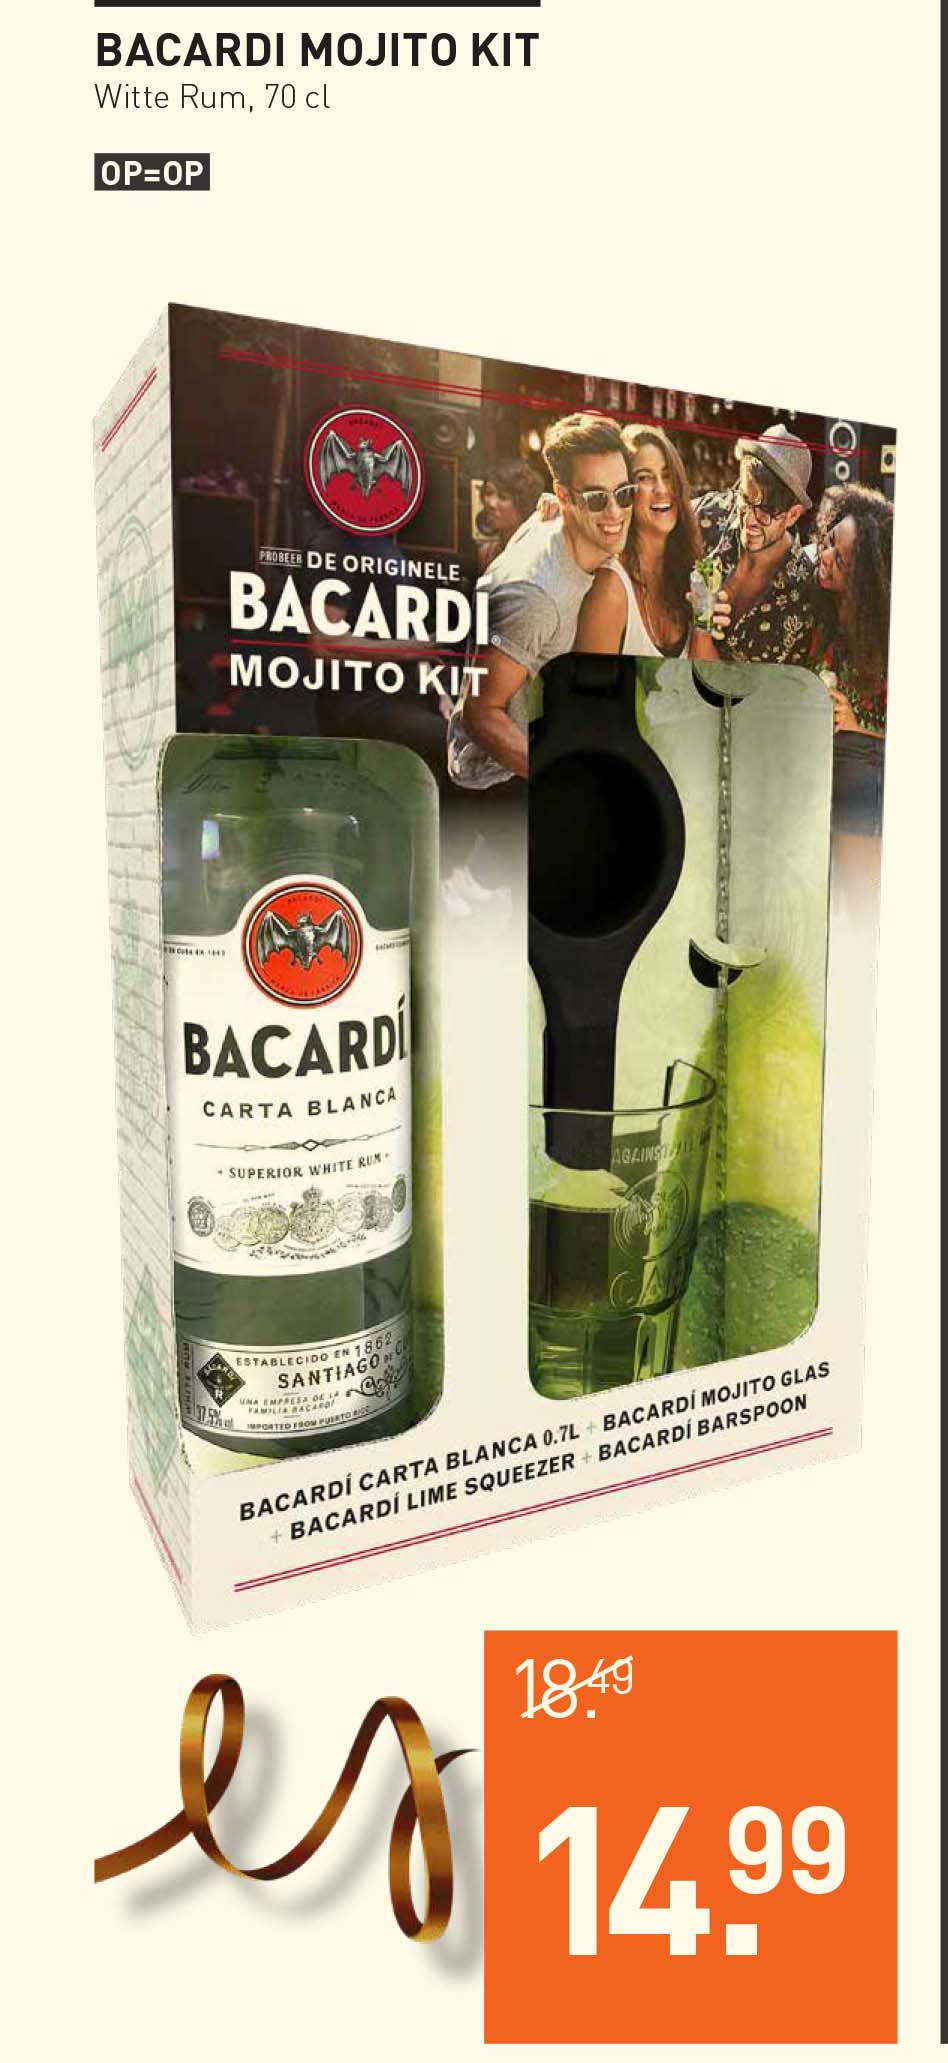 Gall & Gall Bacardi Mojito Kit